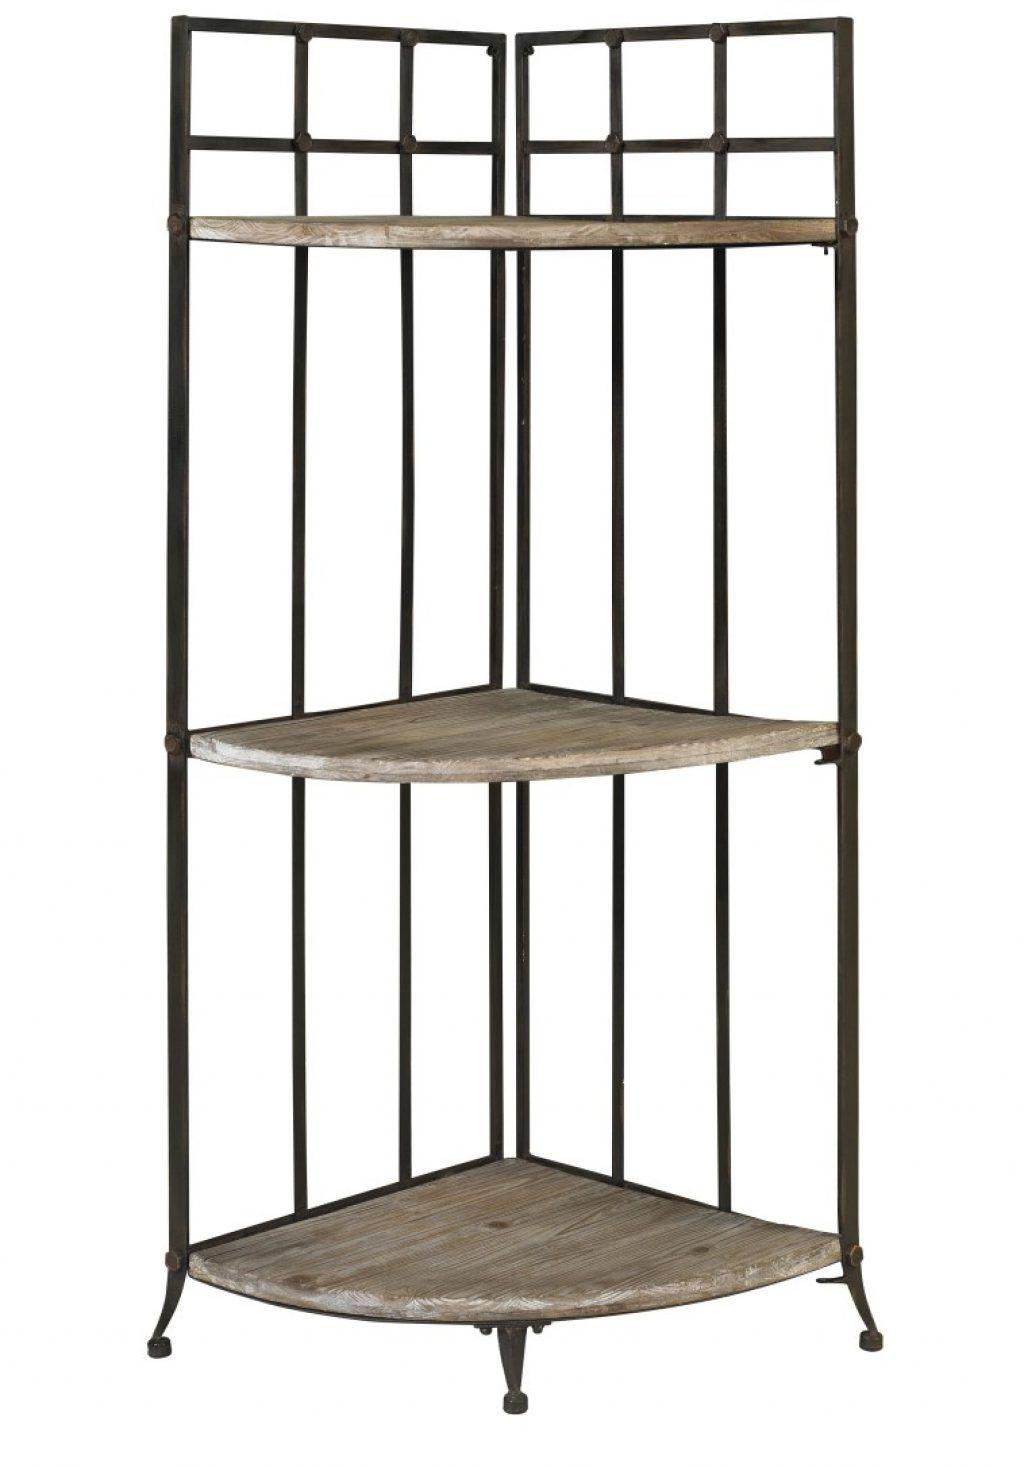 Awesome Vintage Driftwood Ladder Corner Shelf With Black Metal Frame As Well As Corner Bookshelf Unit Plus Large Shelves Corner Shelves Corner Bookshelves Corner Shelf Unit